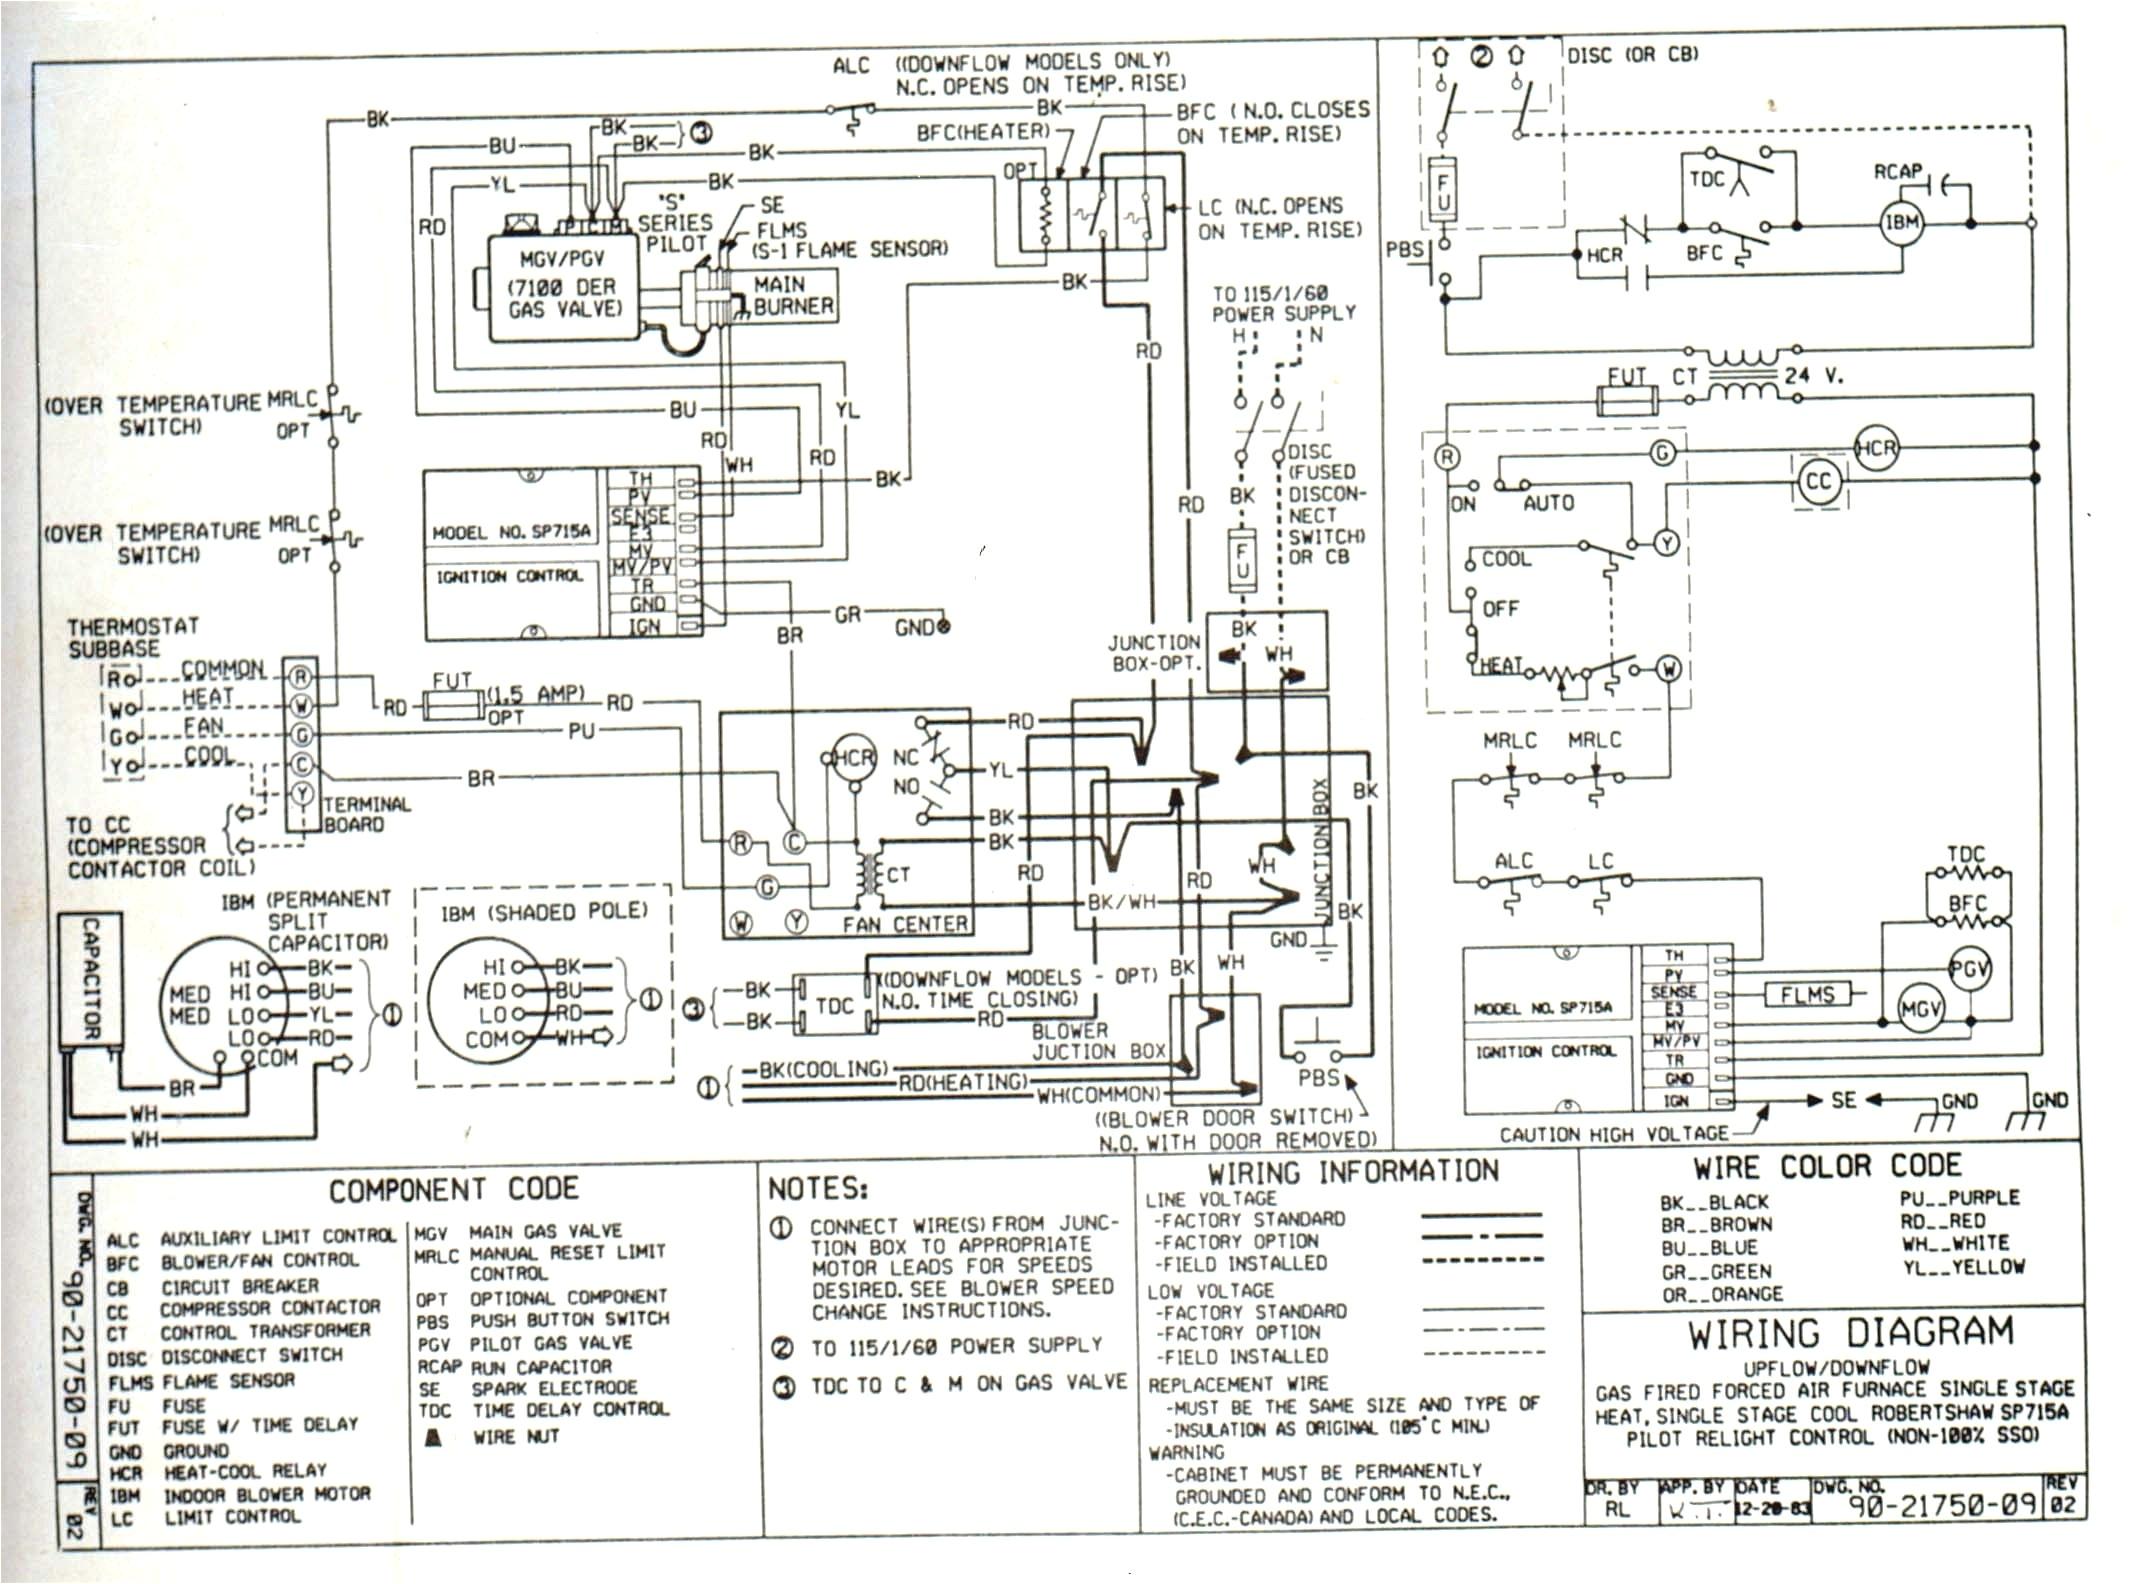 york elec d2eg060 diagram wiring diagram guide for dummies york elec d2eg060 diagram